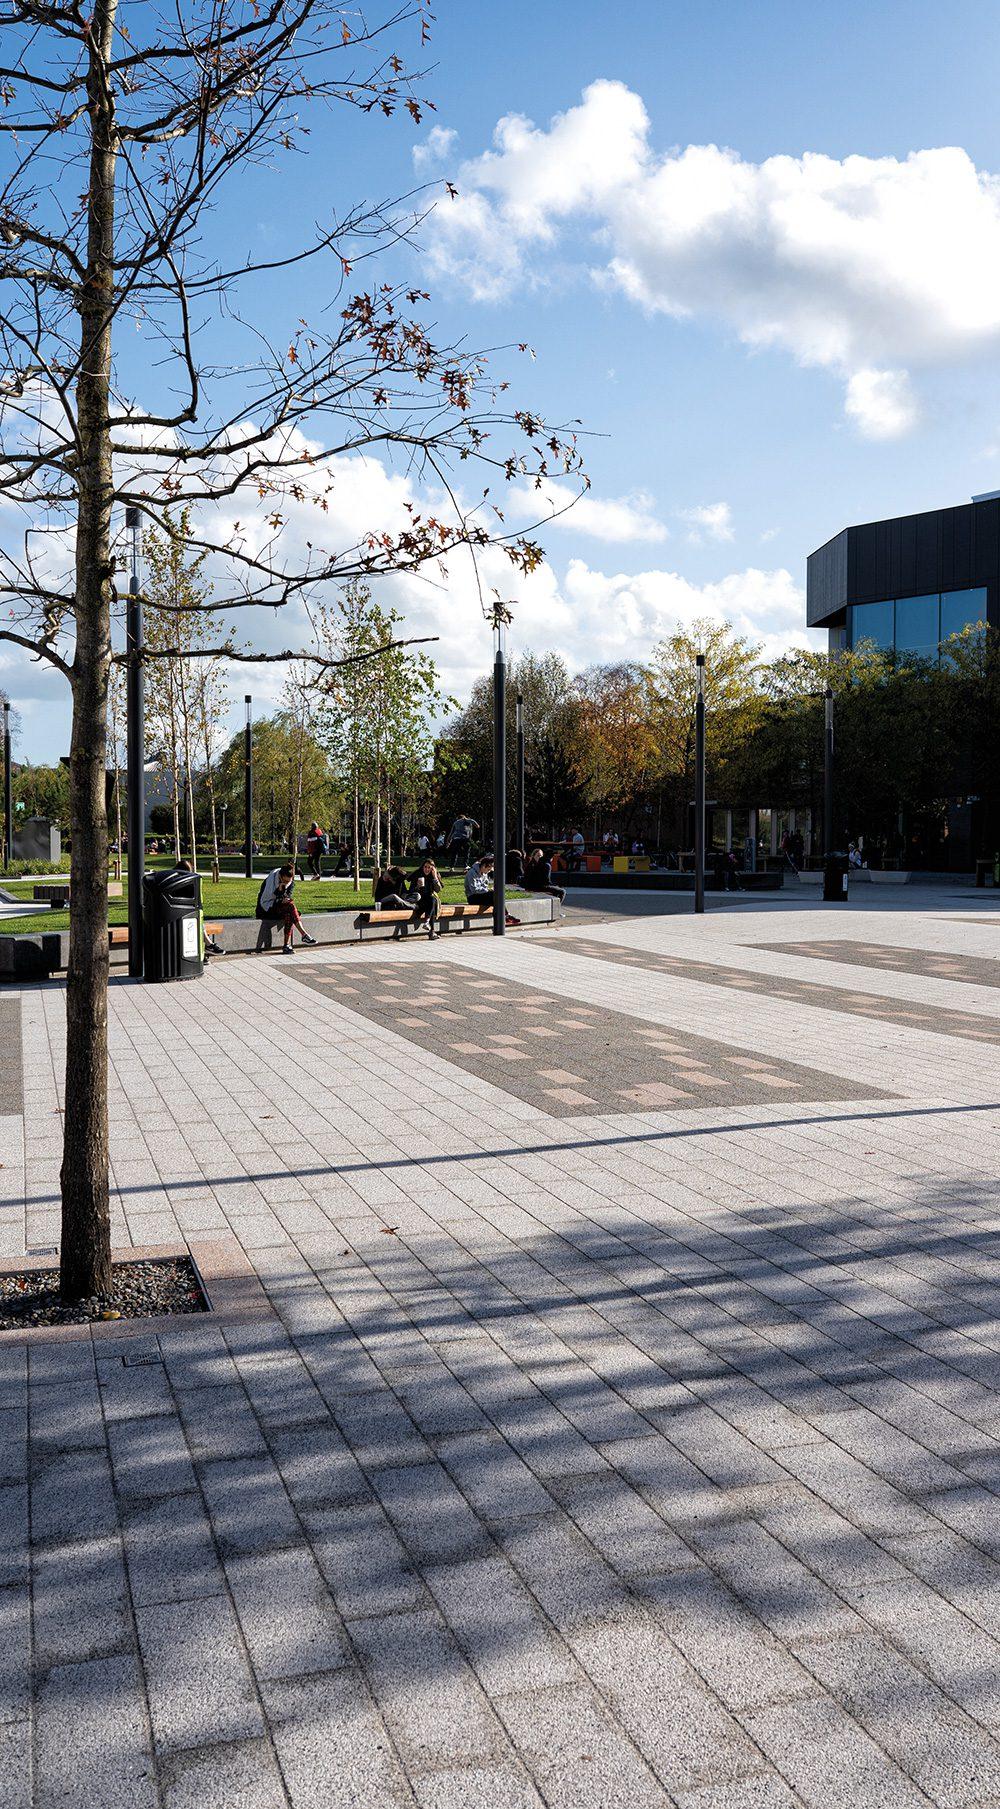 Dublin City University, Ballymun, County Dublin featured image